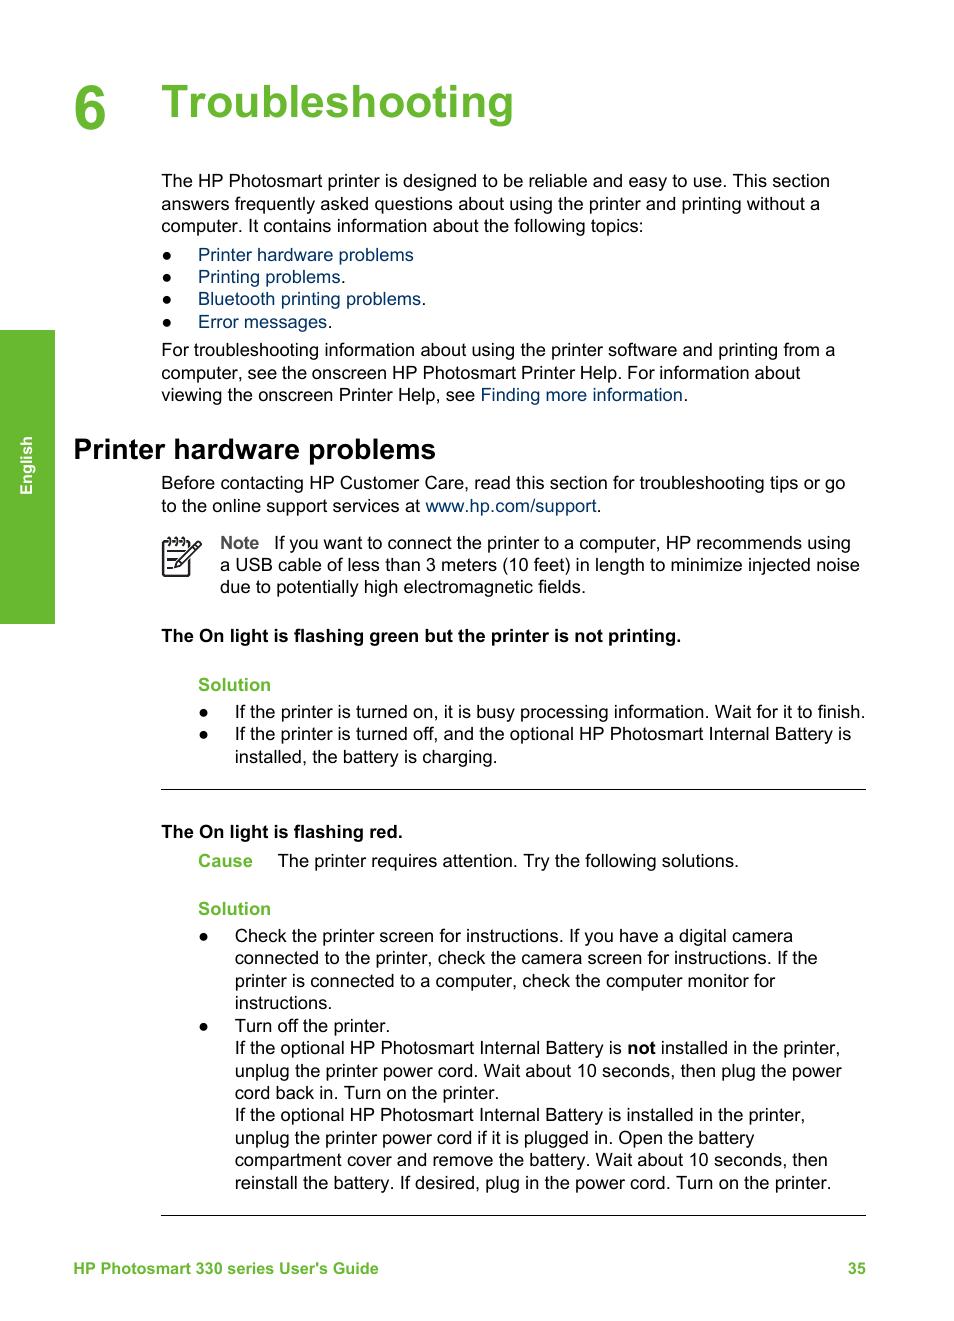 Troubleshooting, Printer hardware problems | HP Photosmart 335